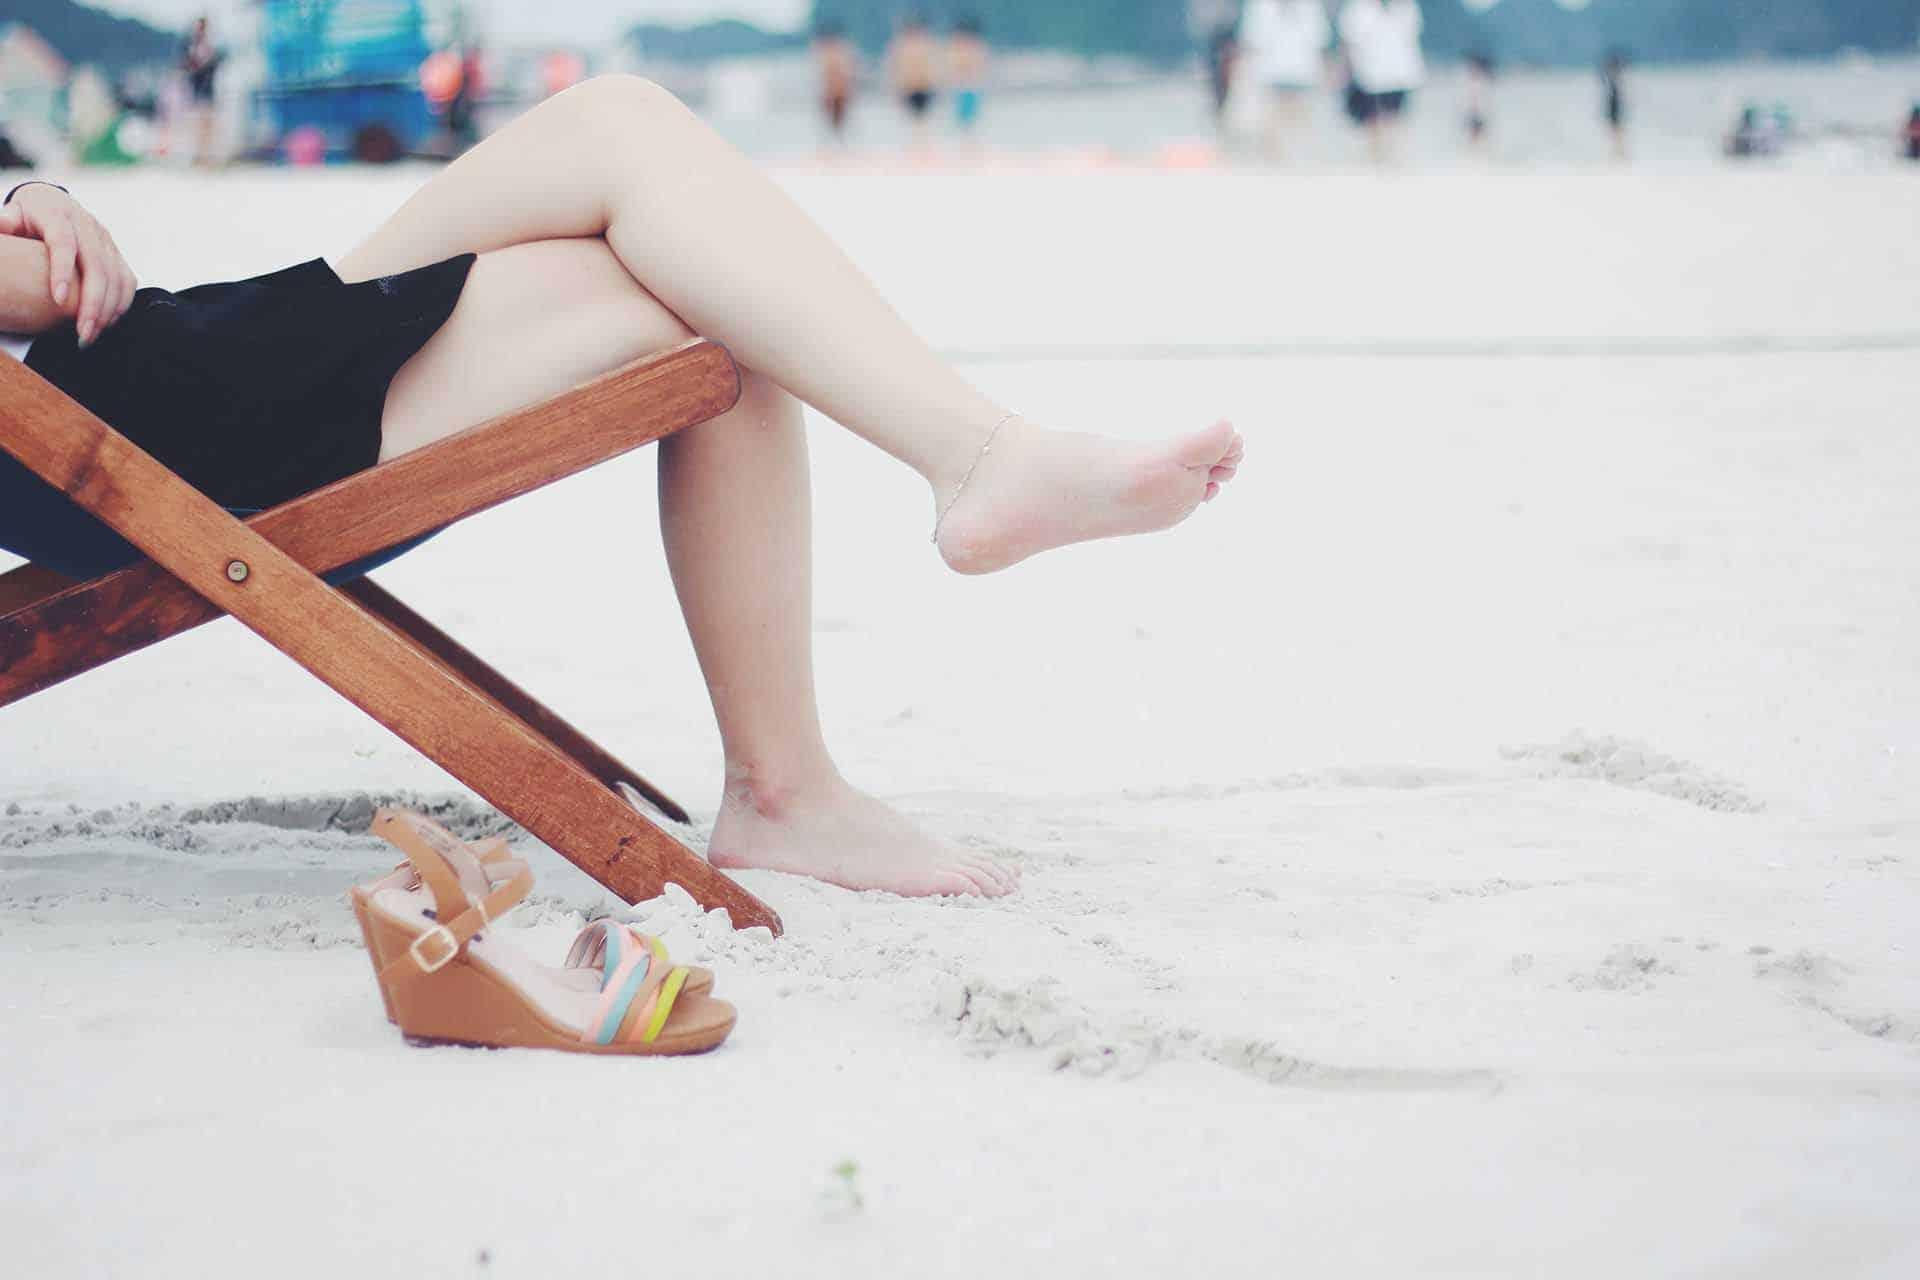 t2informatik Blog: More success with composure